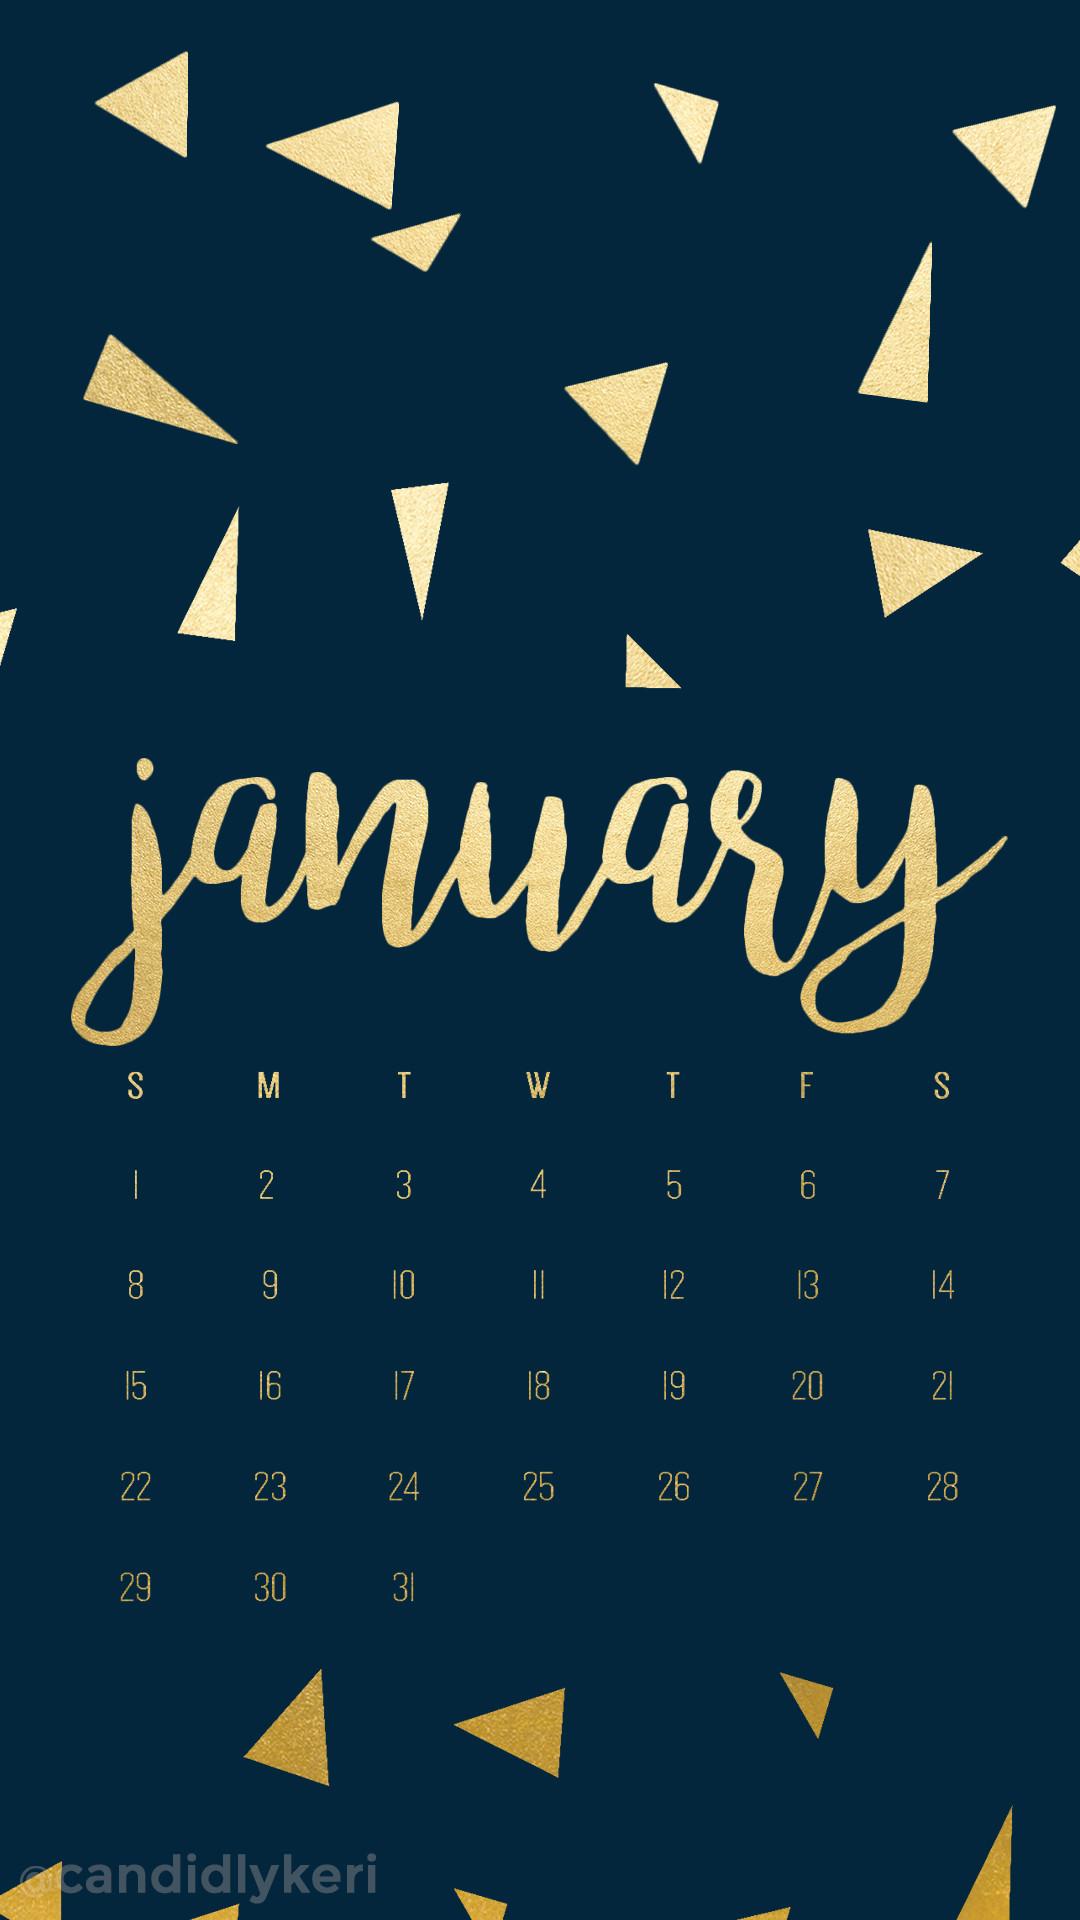 January iPhone Wallpaper · january2m january6m december28m january10m  january11m january3m january4m